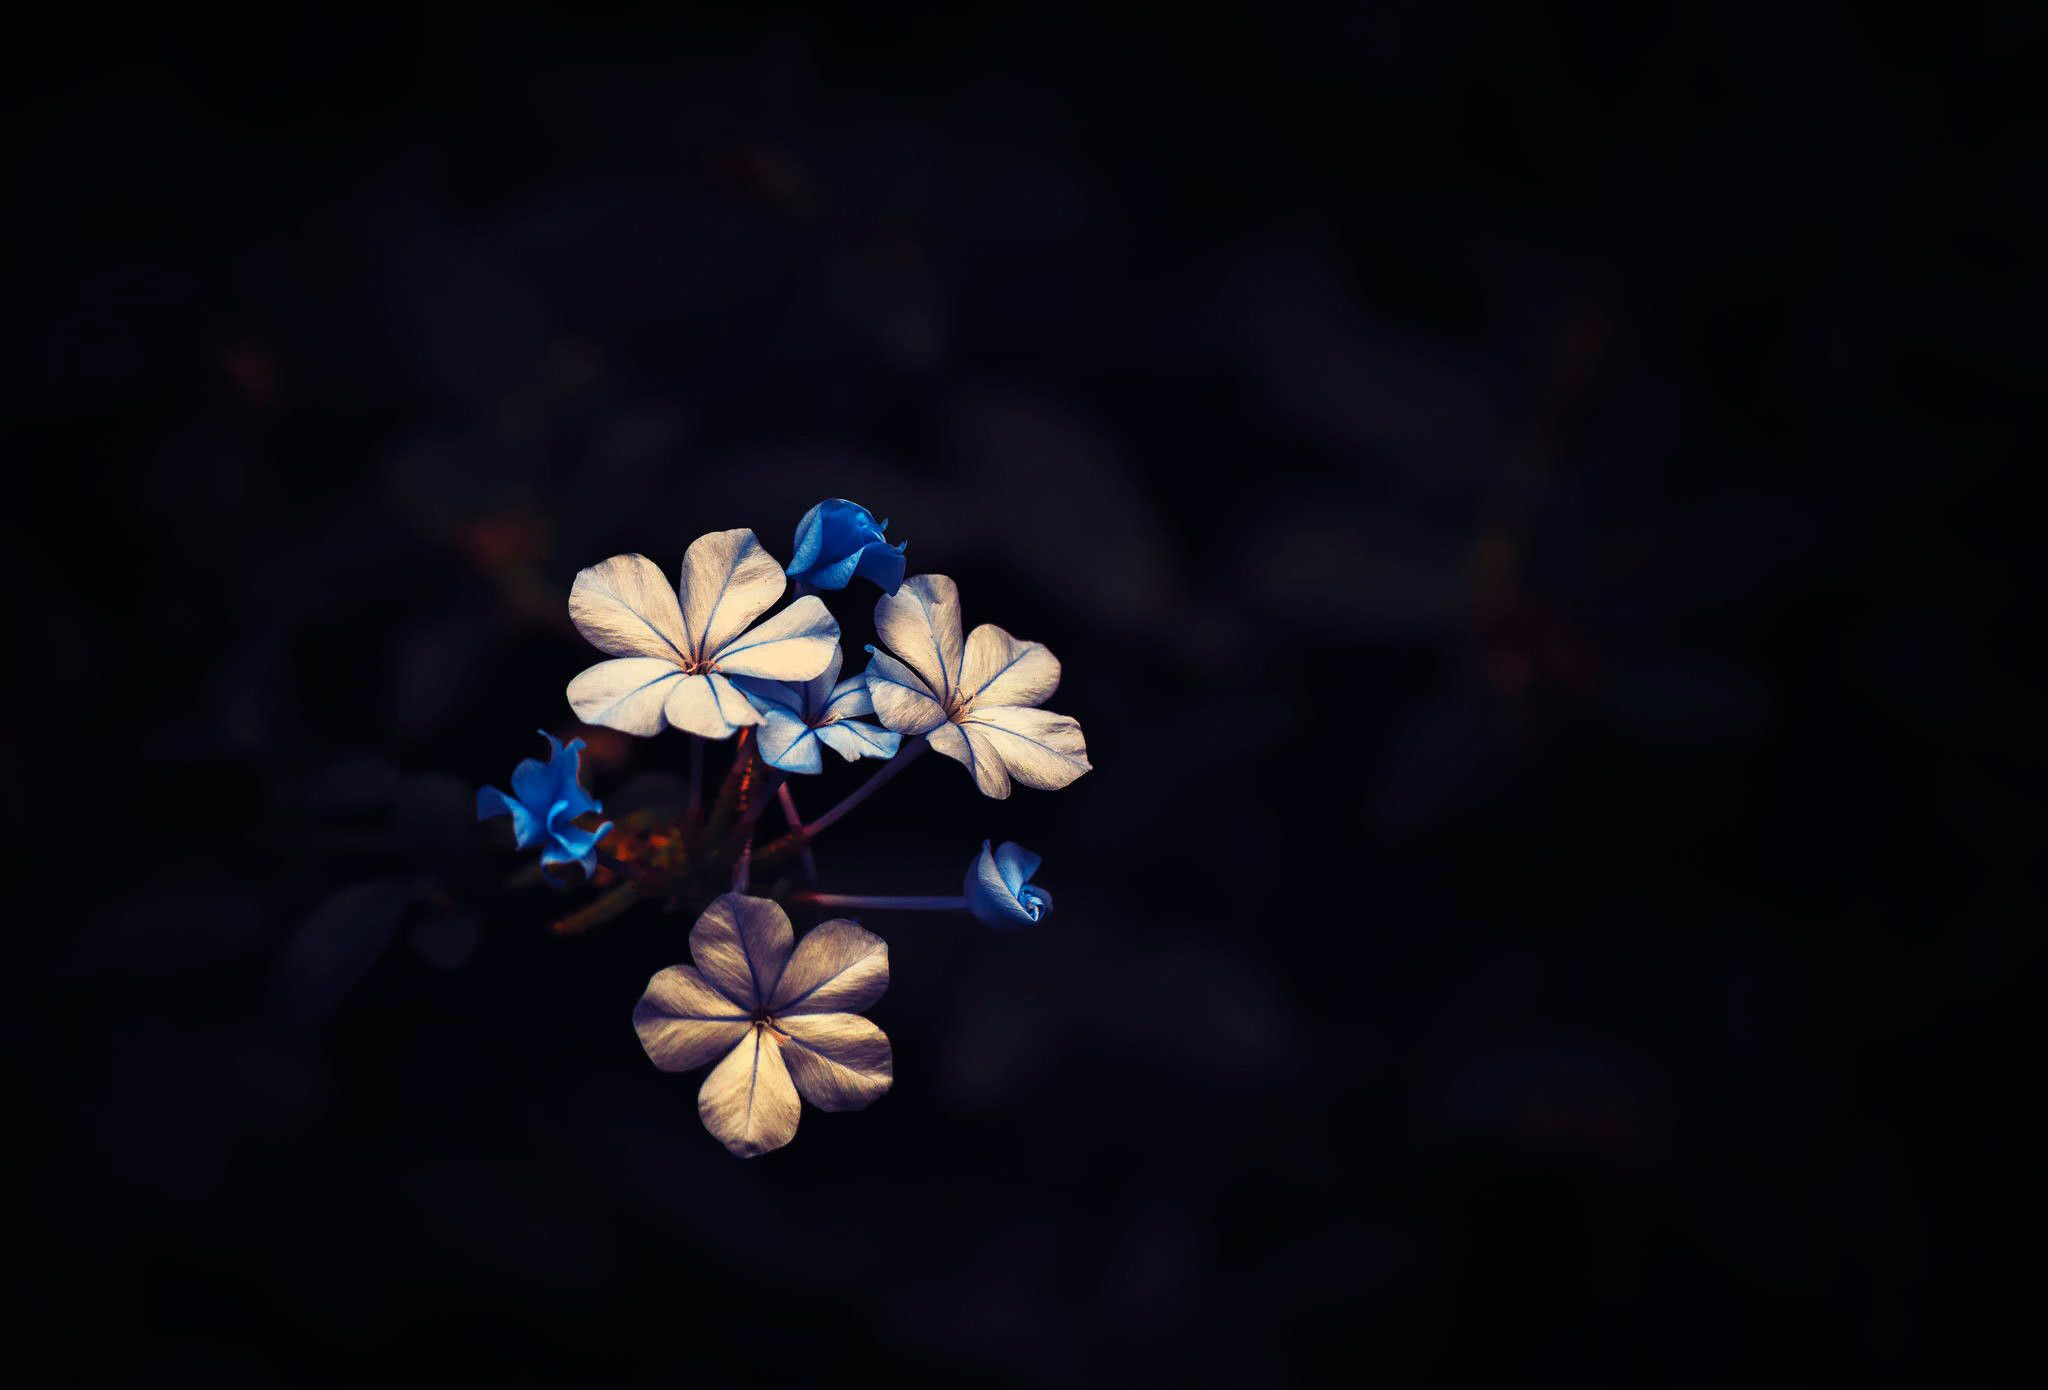 Dark Hd Flowers Wallpapers Top Free Dark Hd Flowers Backgrounds Wallpaperaccess